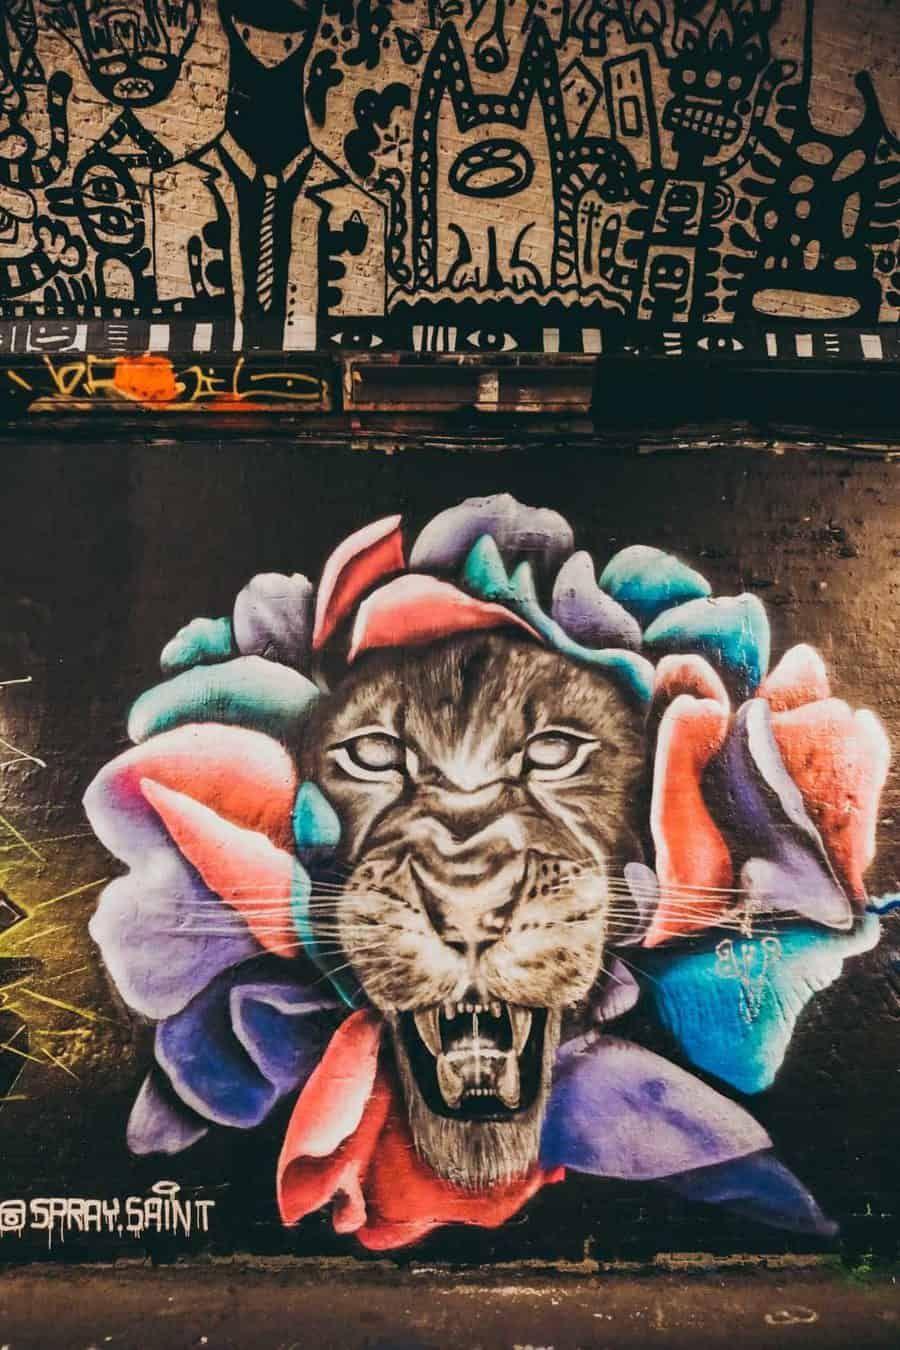 Cool street art in the Graffiti Tunnel London